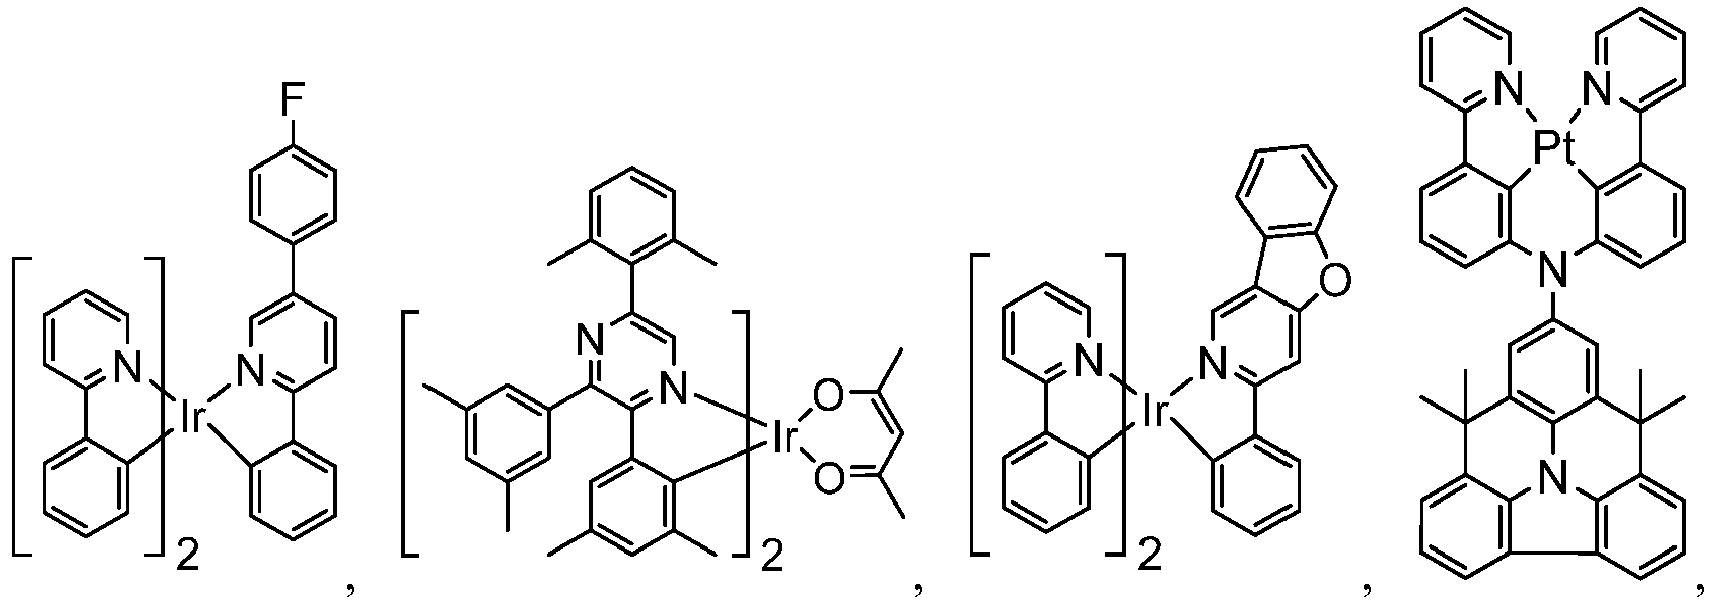 Figure imgb0925